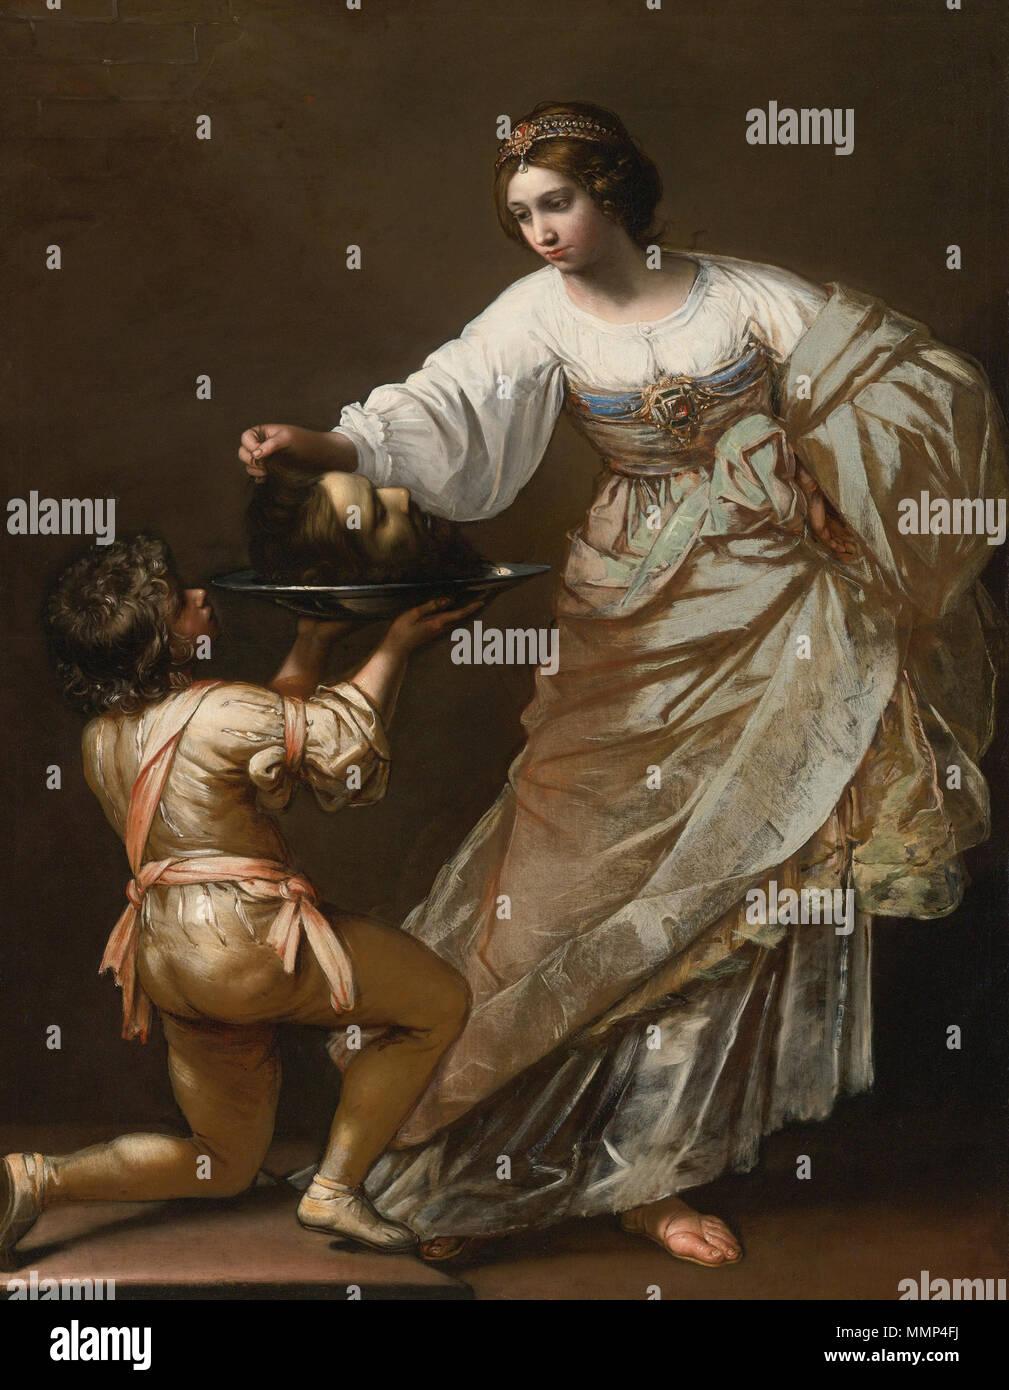 1612 14 Imágenes De Stock & 1612 14 Fotos De Stock - Alamy